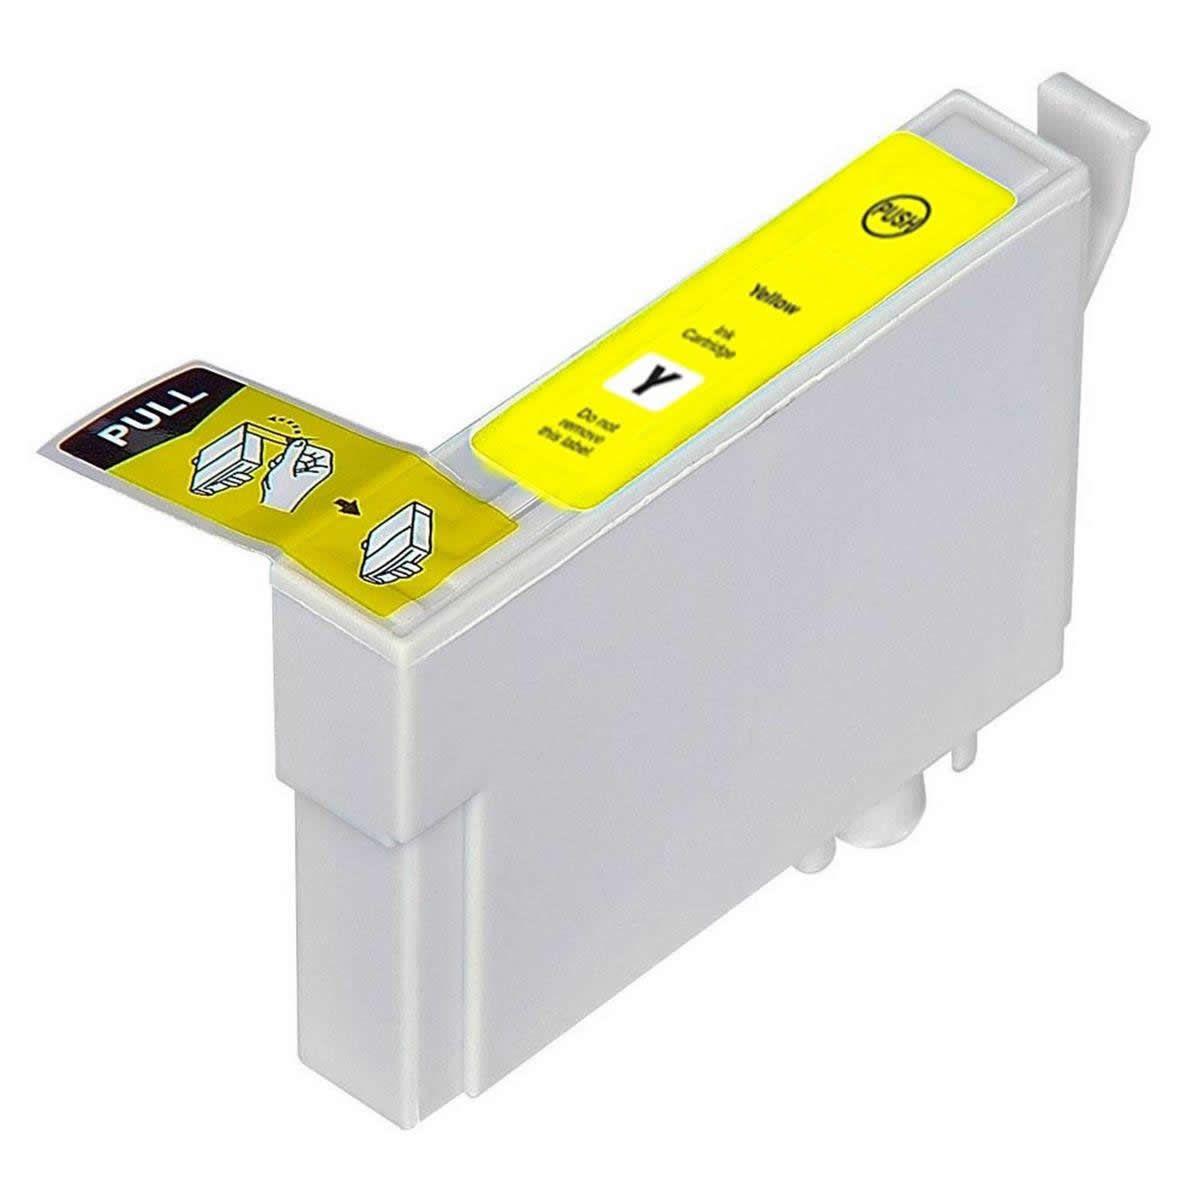 Cartucho MJ Compatível T1334 Amarelo 13ml para T22 T25 TX120 TX123 TX130 TX133 TX320F TX235W TX430W TX420W da EPSON